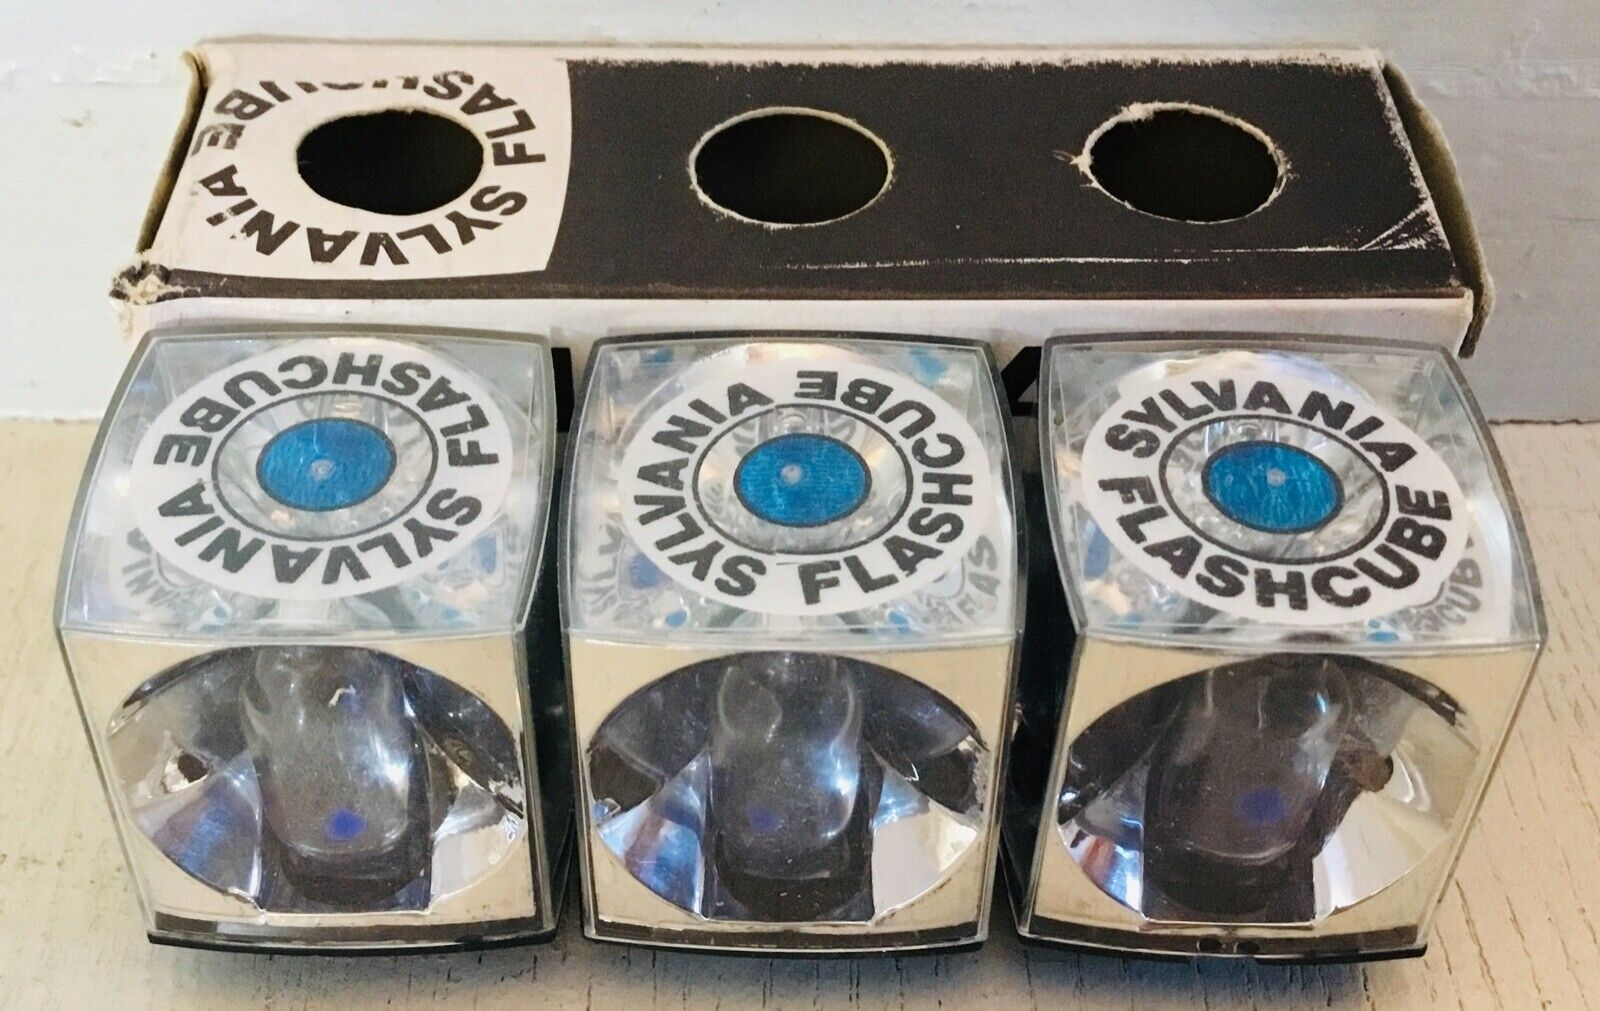 Vintage SYLVANIA Flashcube - 3 flash bulbs in original box = 12 flashes